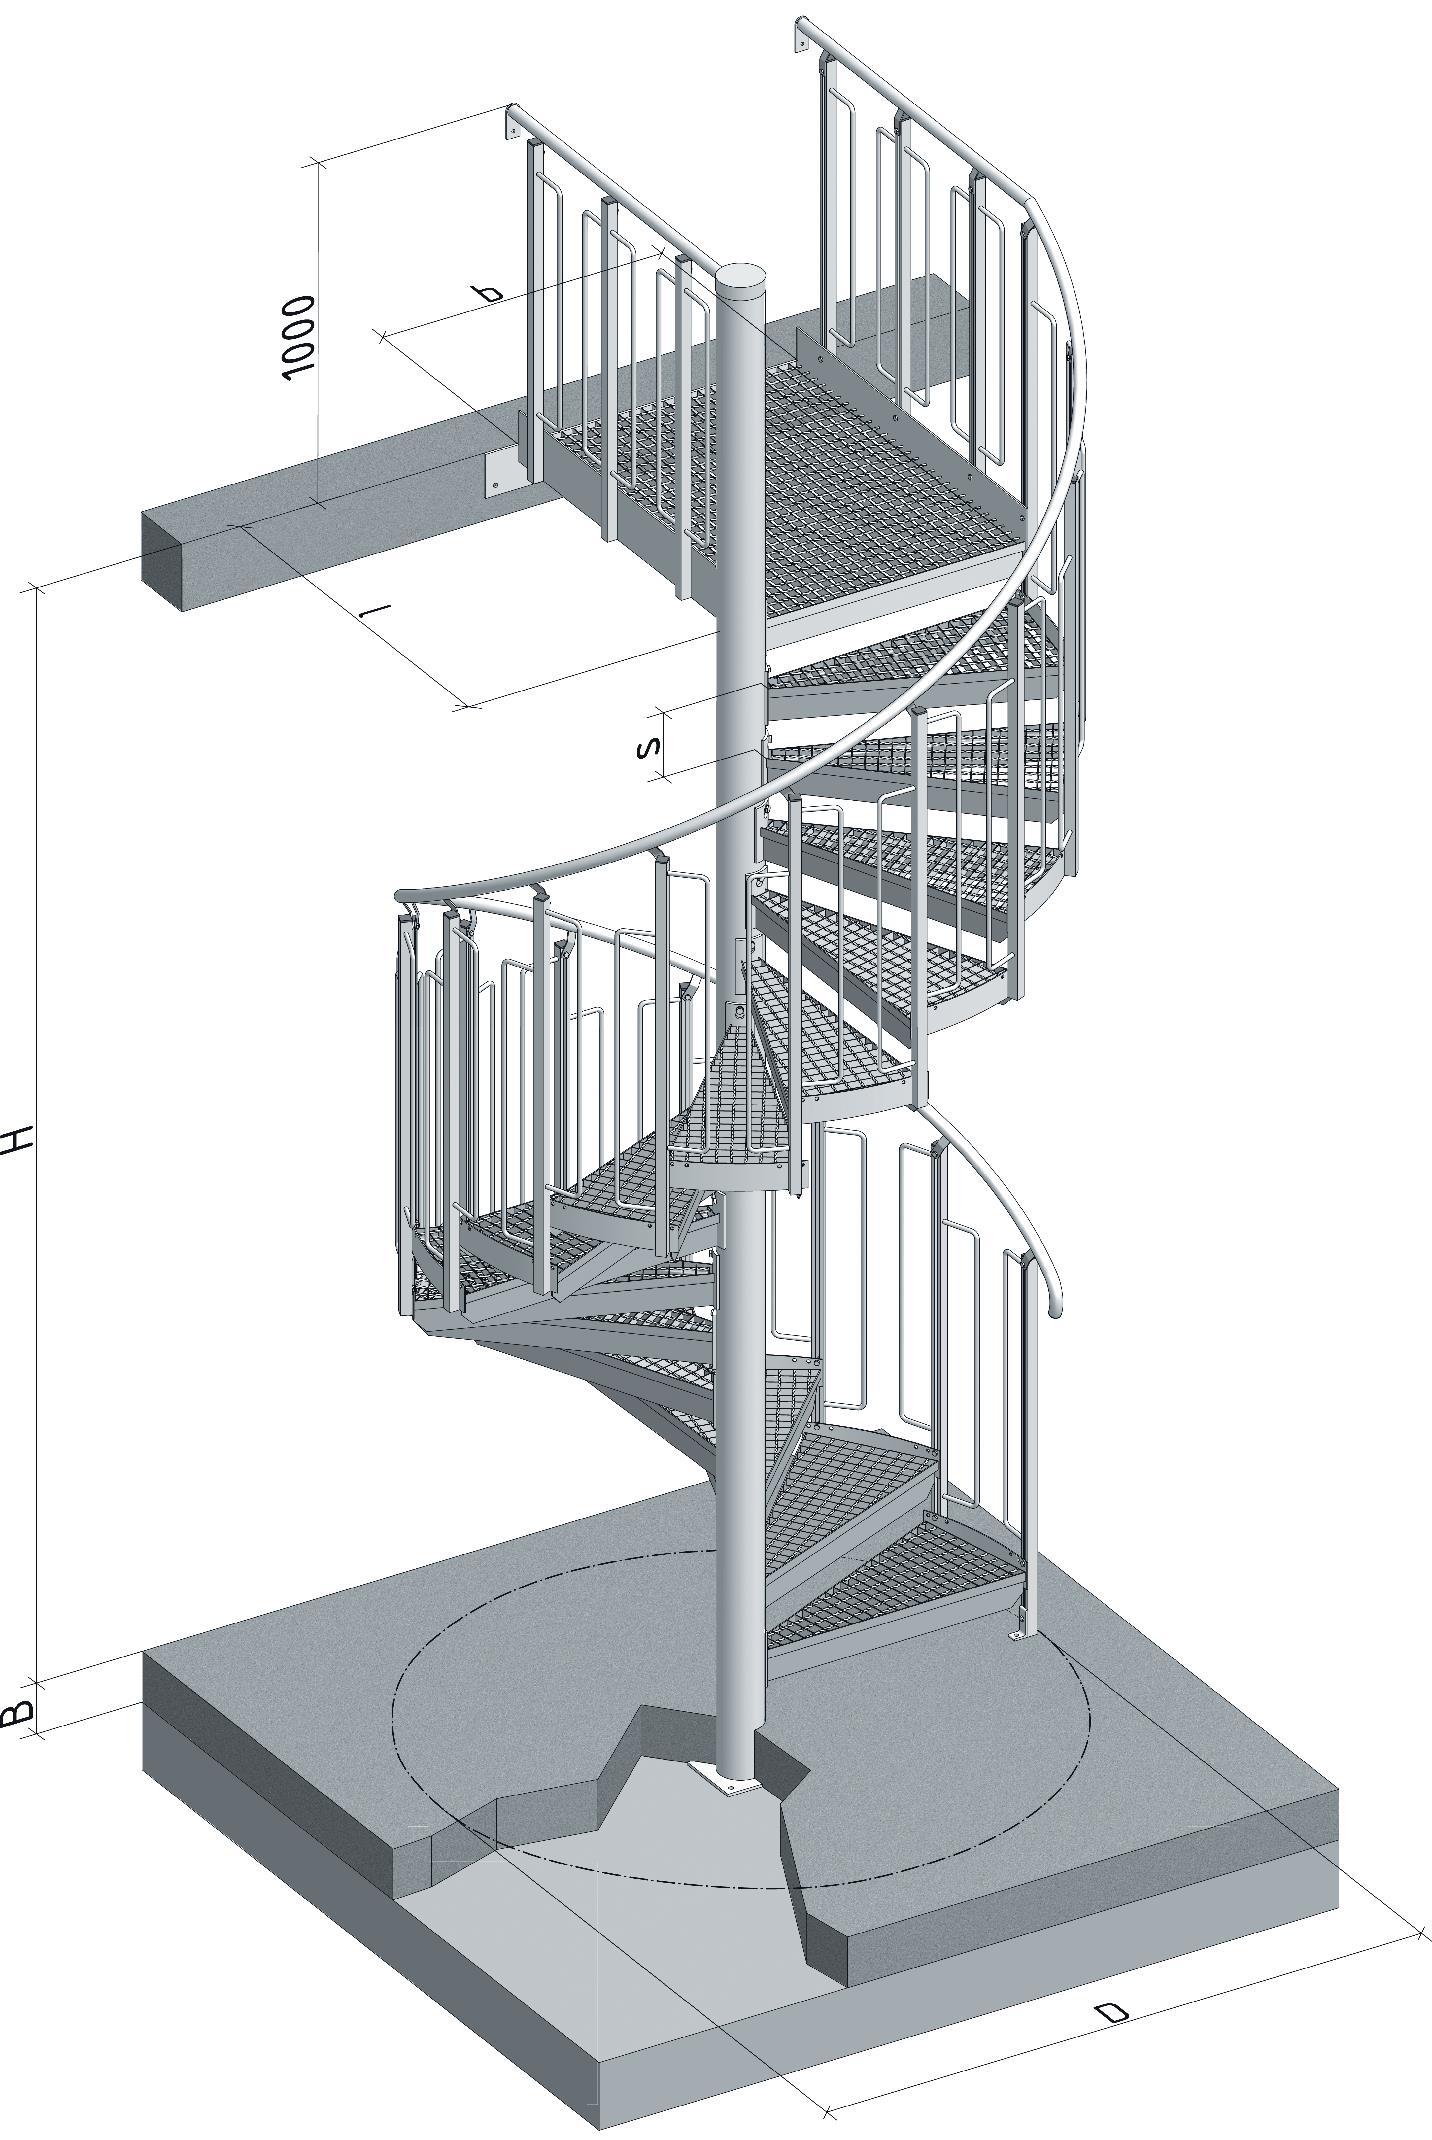 Detaliu Scara spirala LG Standard LICHTGITTER RO - Poza 2